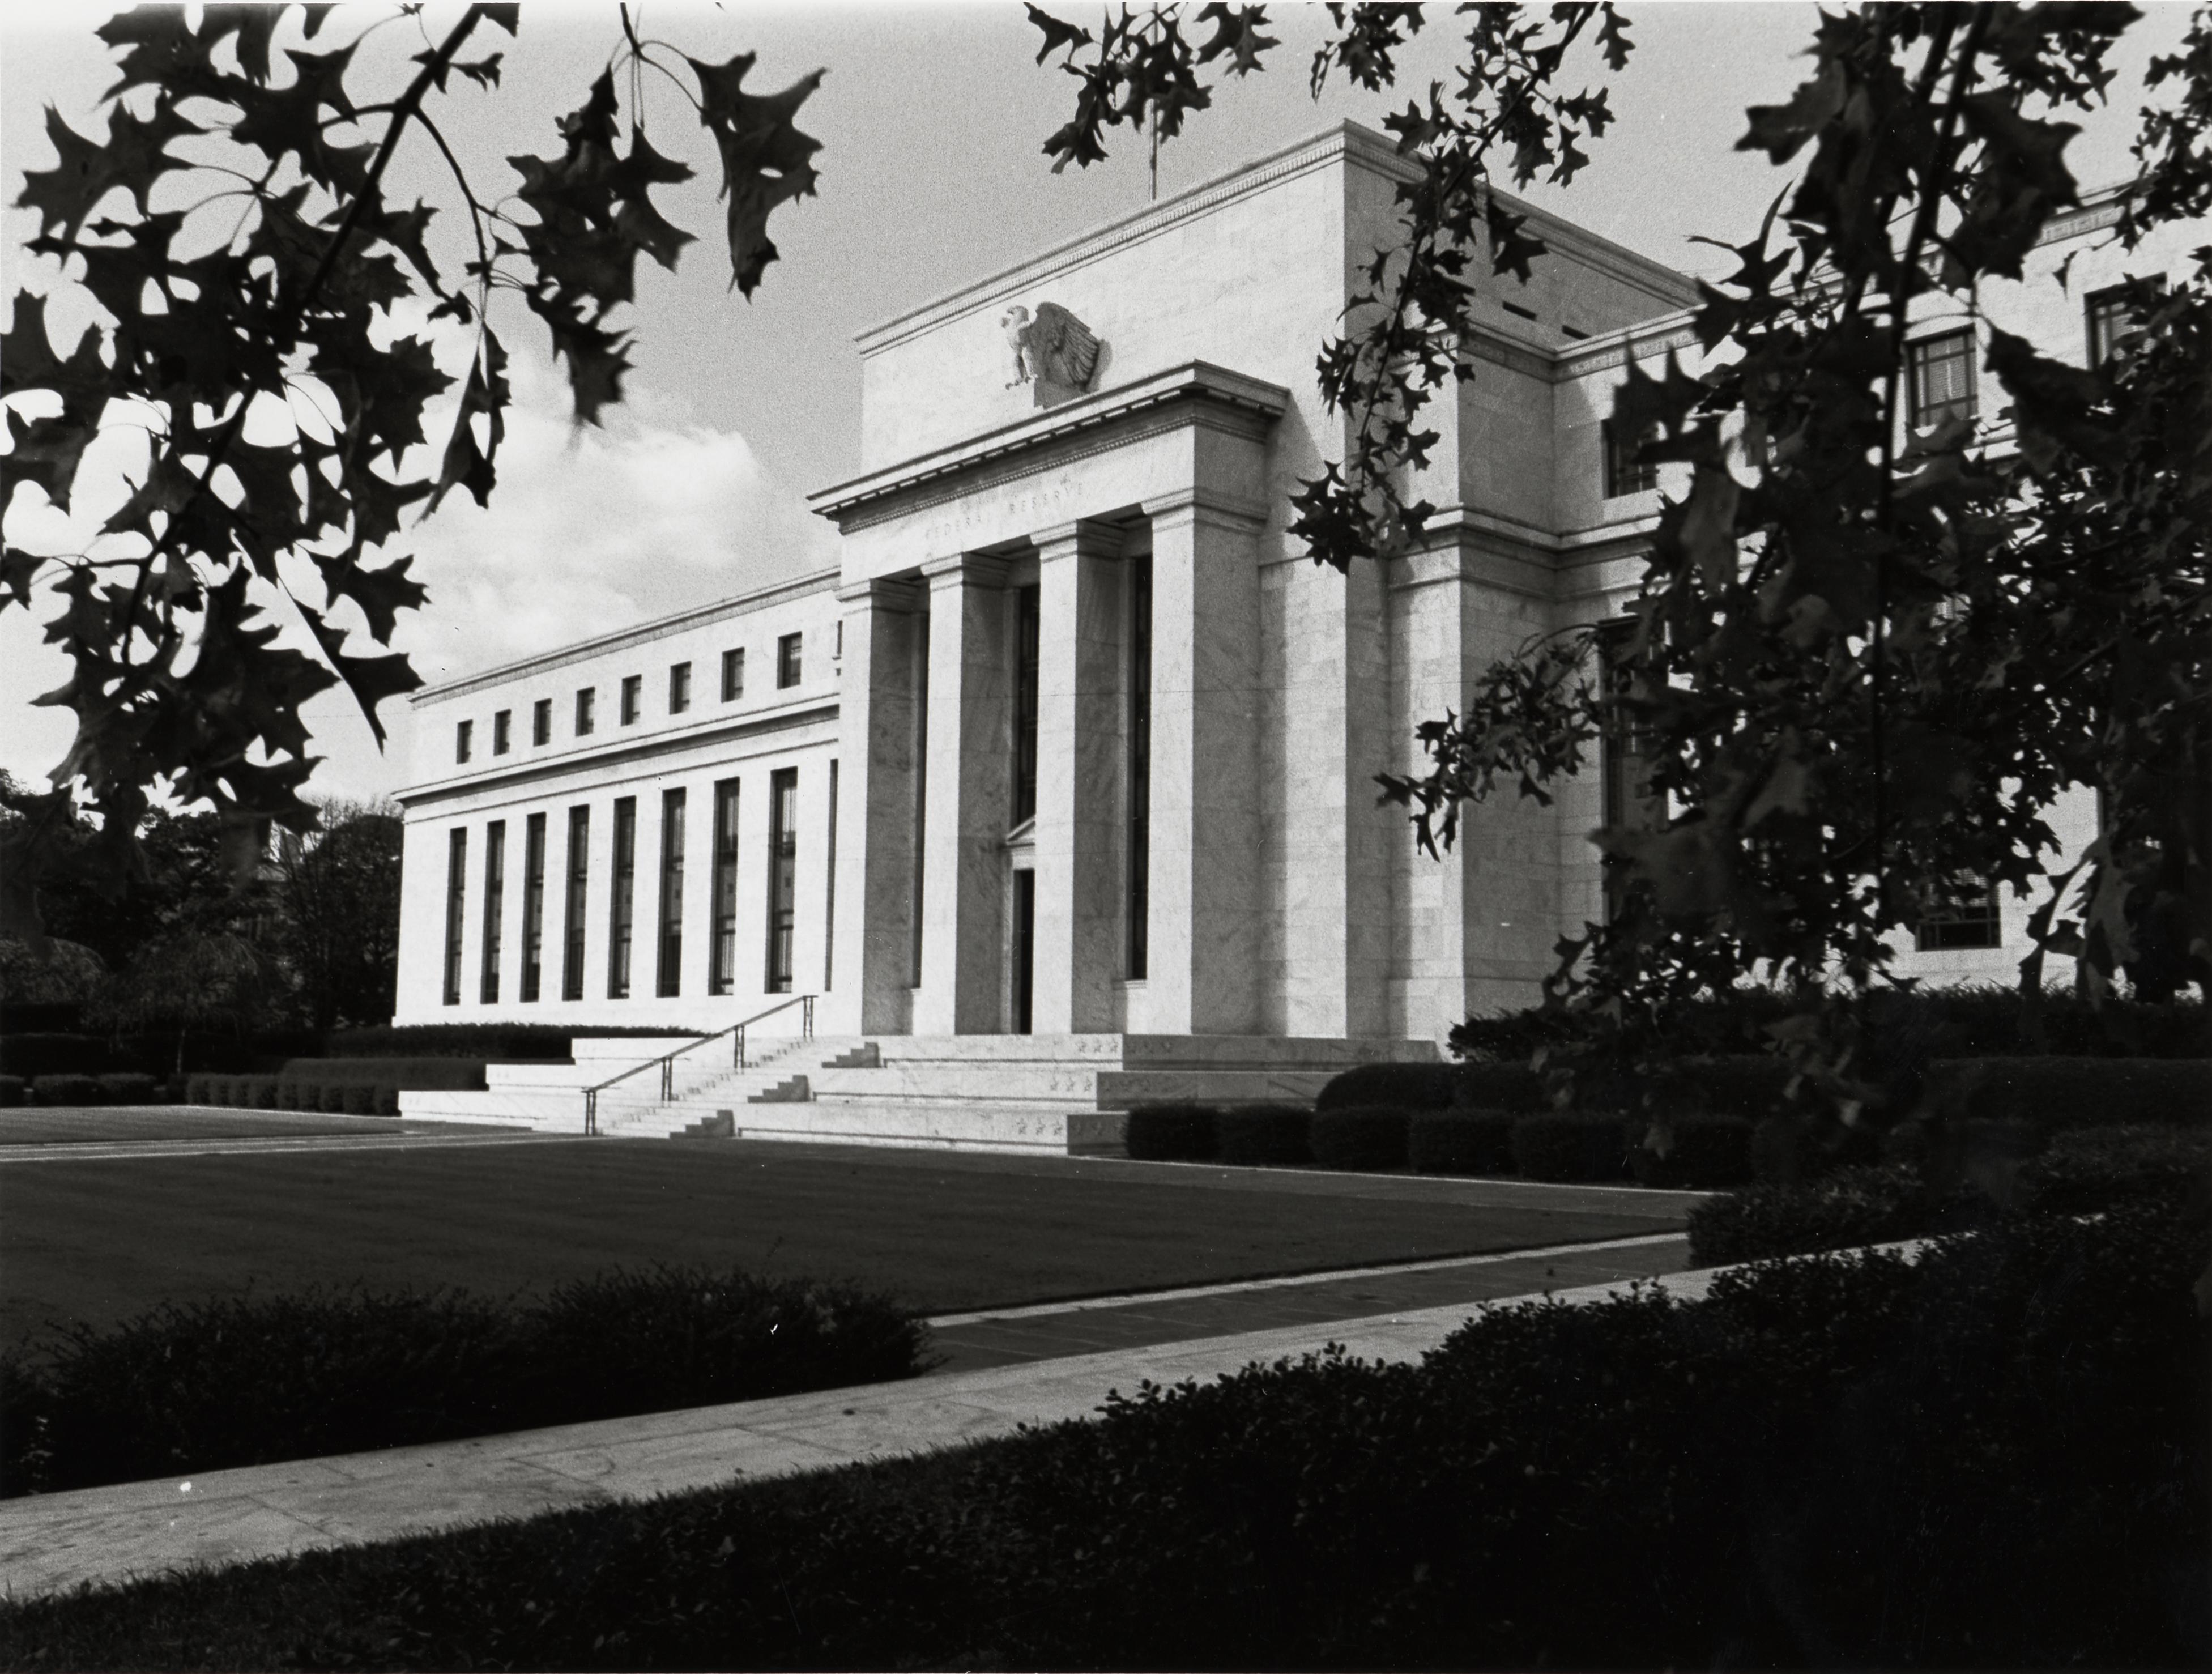 File:US Federal Reserve Eccles Building 1937 jpg - Wikimedia